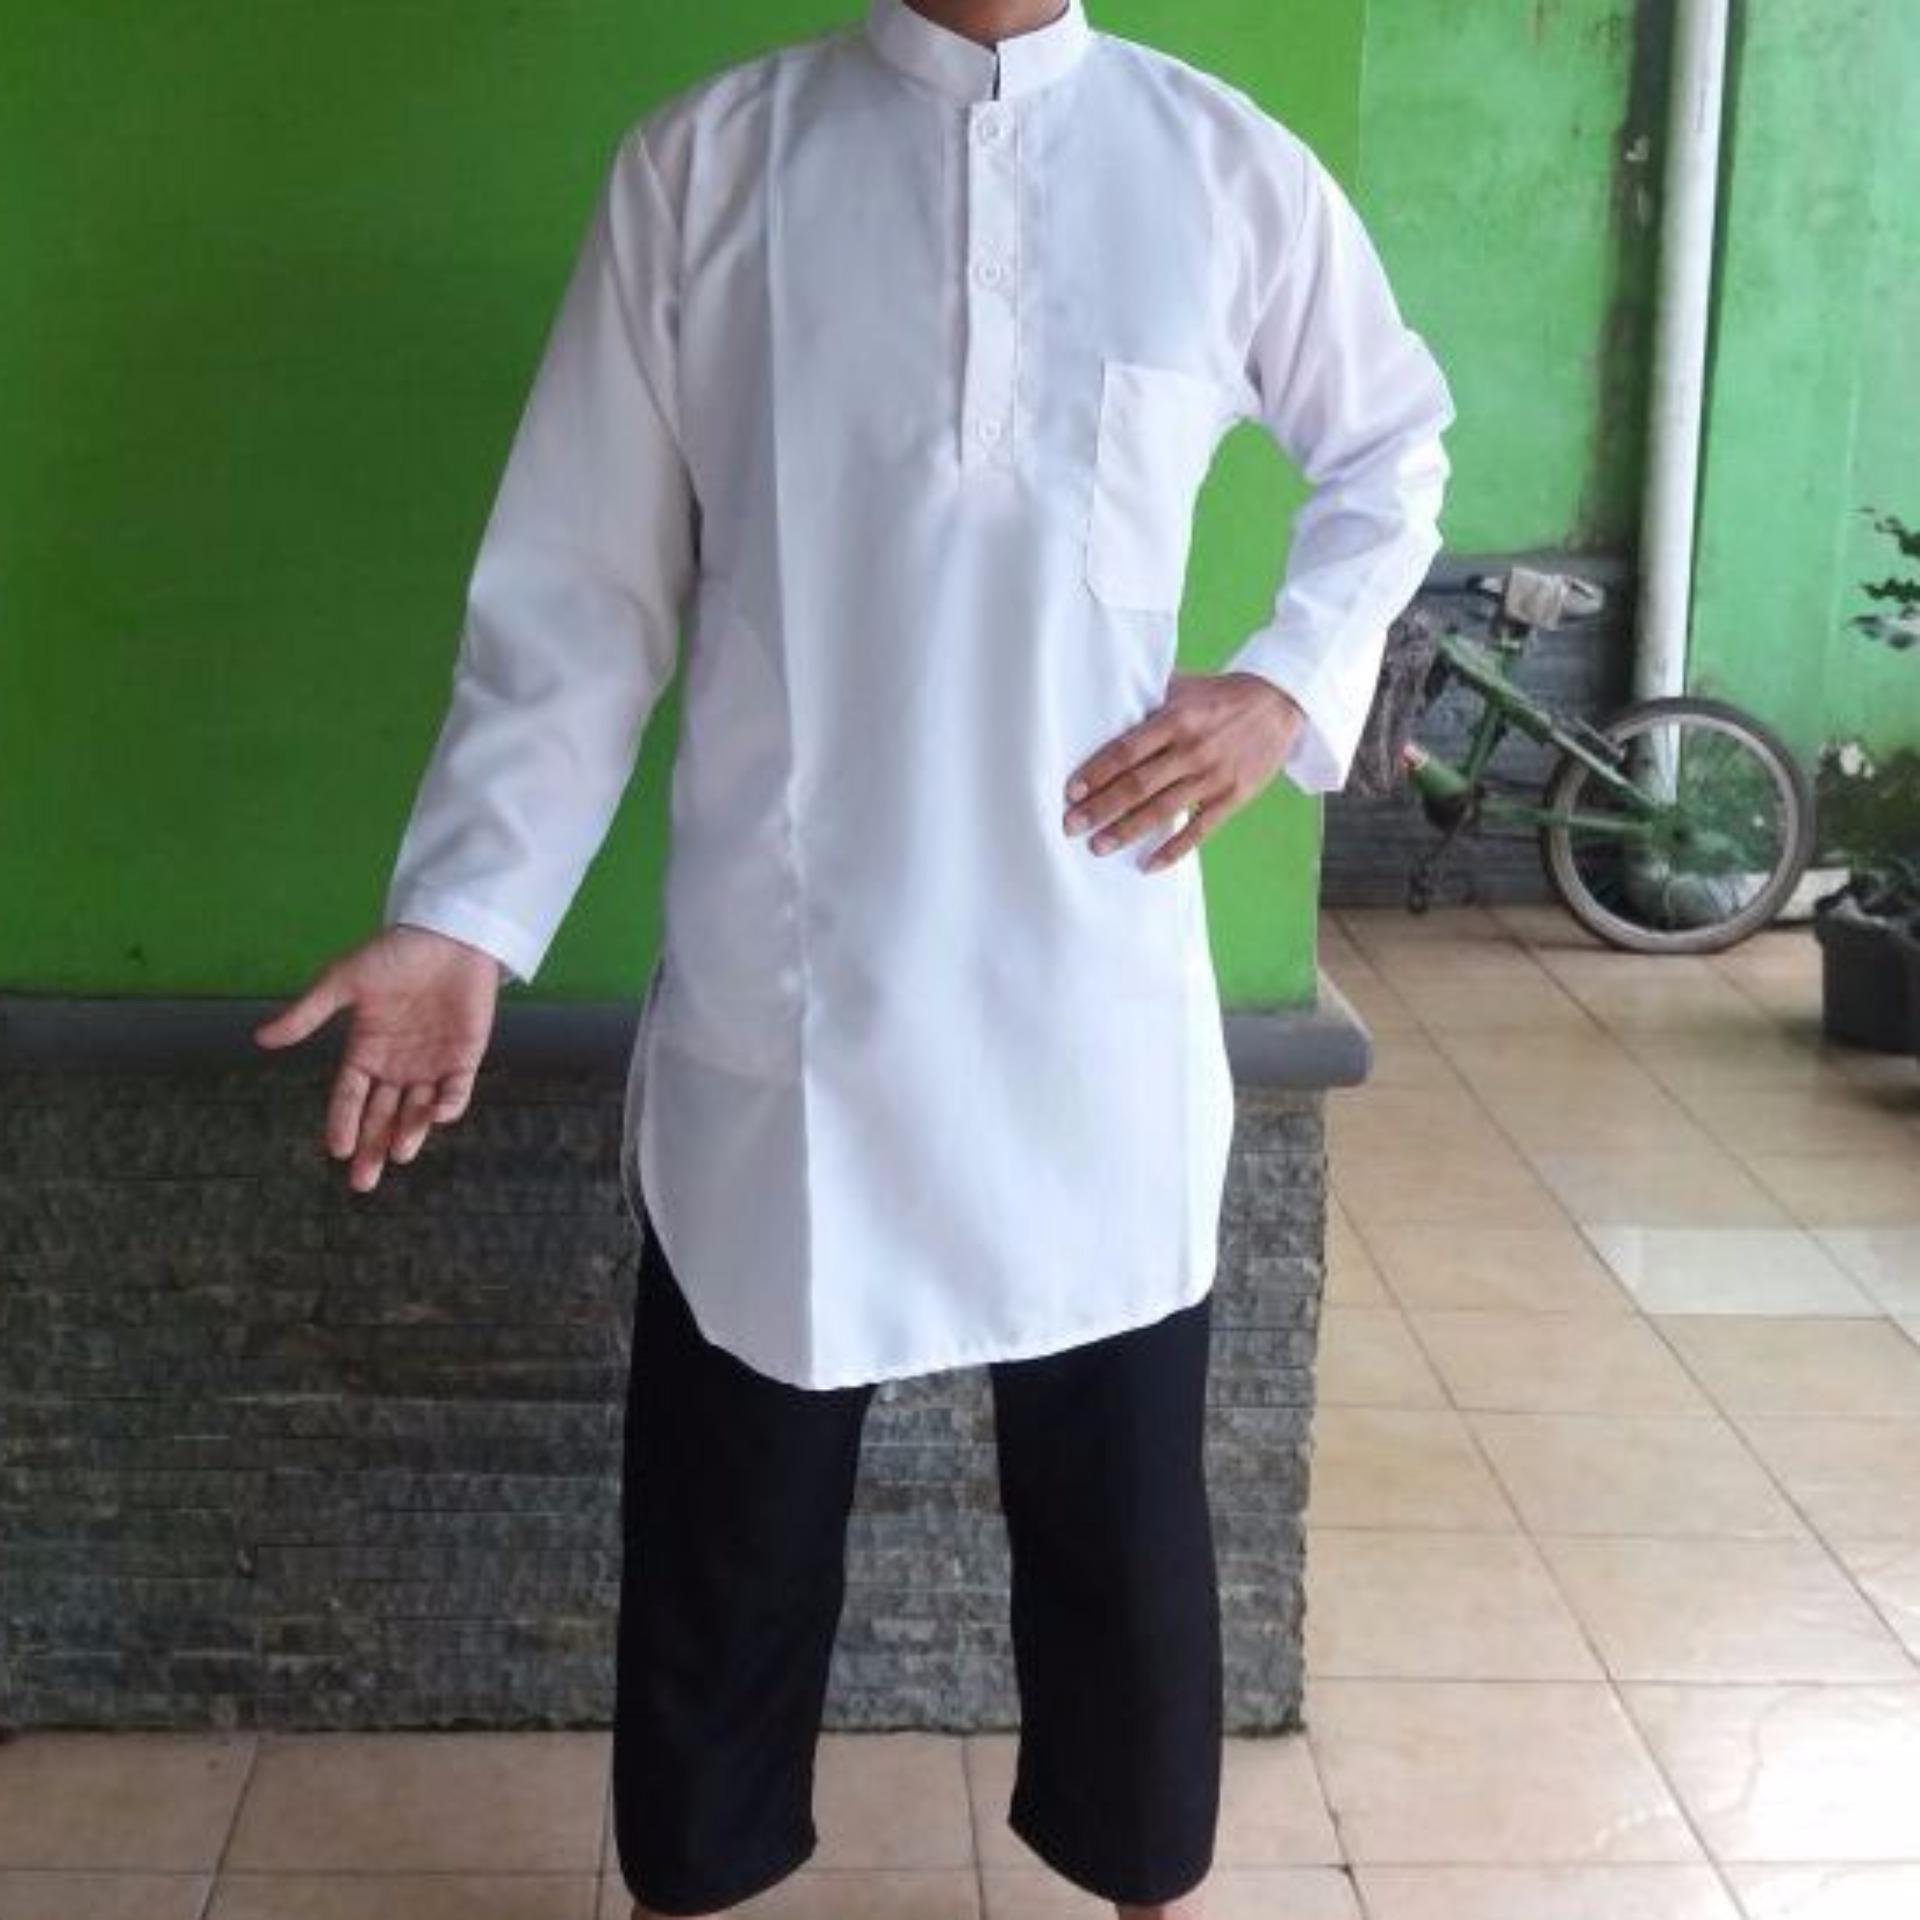 baju gamis putih polos, gamis pria, gamis pakistan